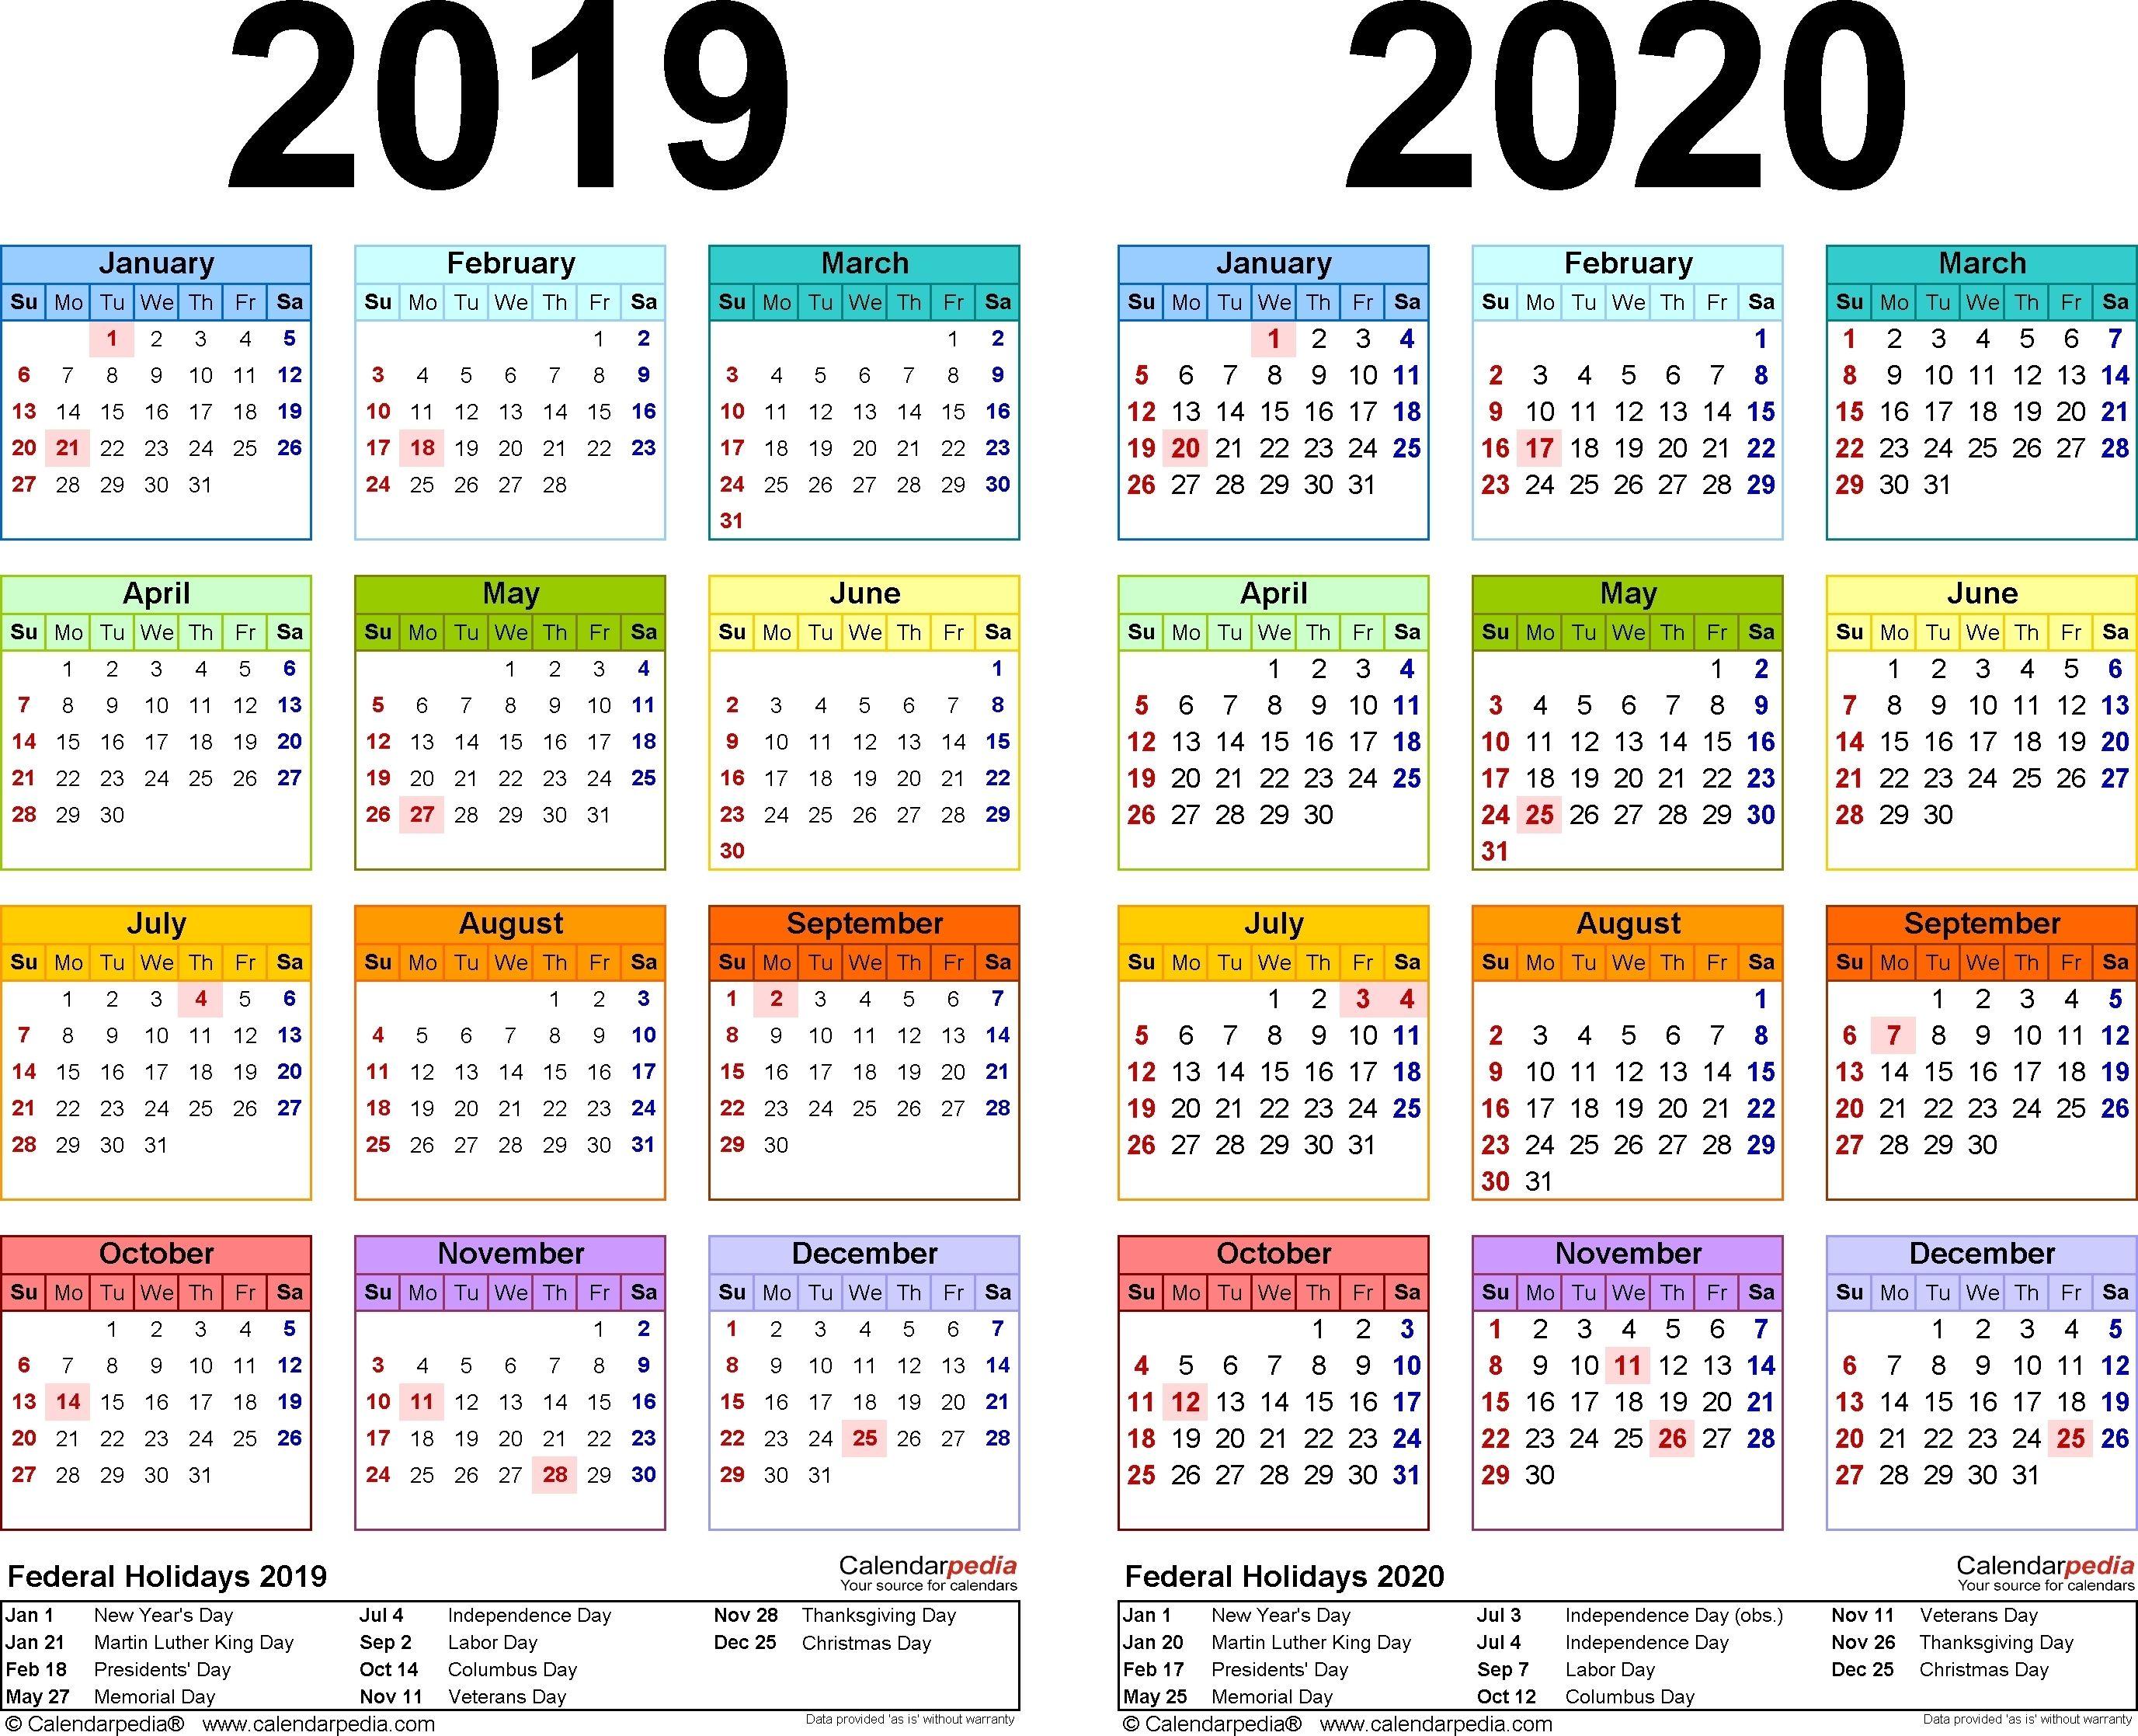 Extraordinary Hong Kong Public Holidays 2020 In 2020 Calendar Template Printable Calendar Template Excel Calendar